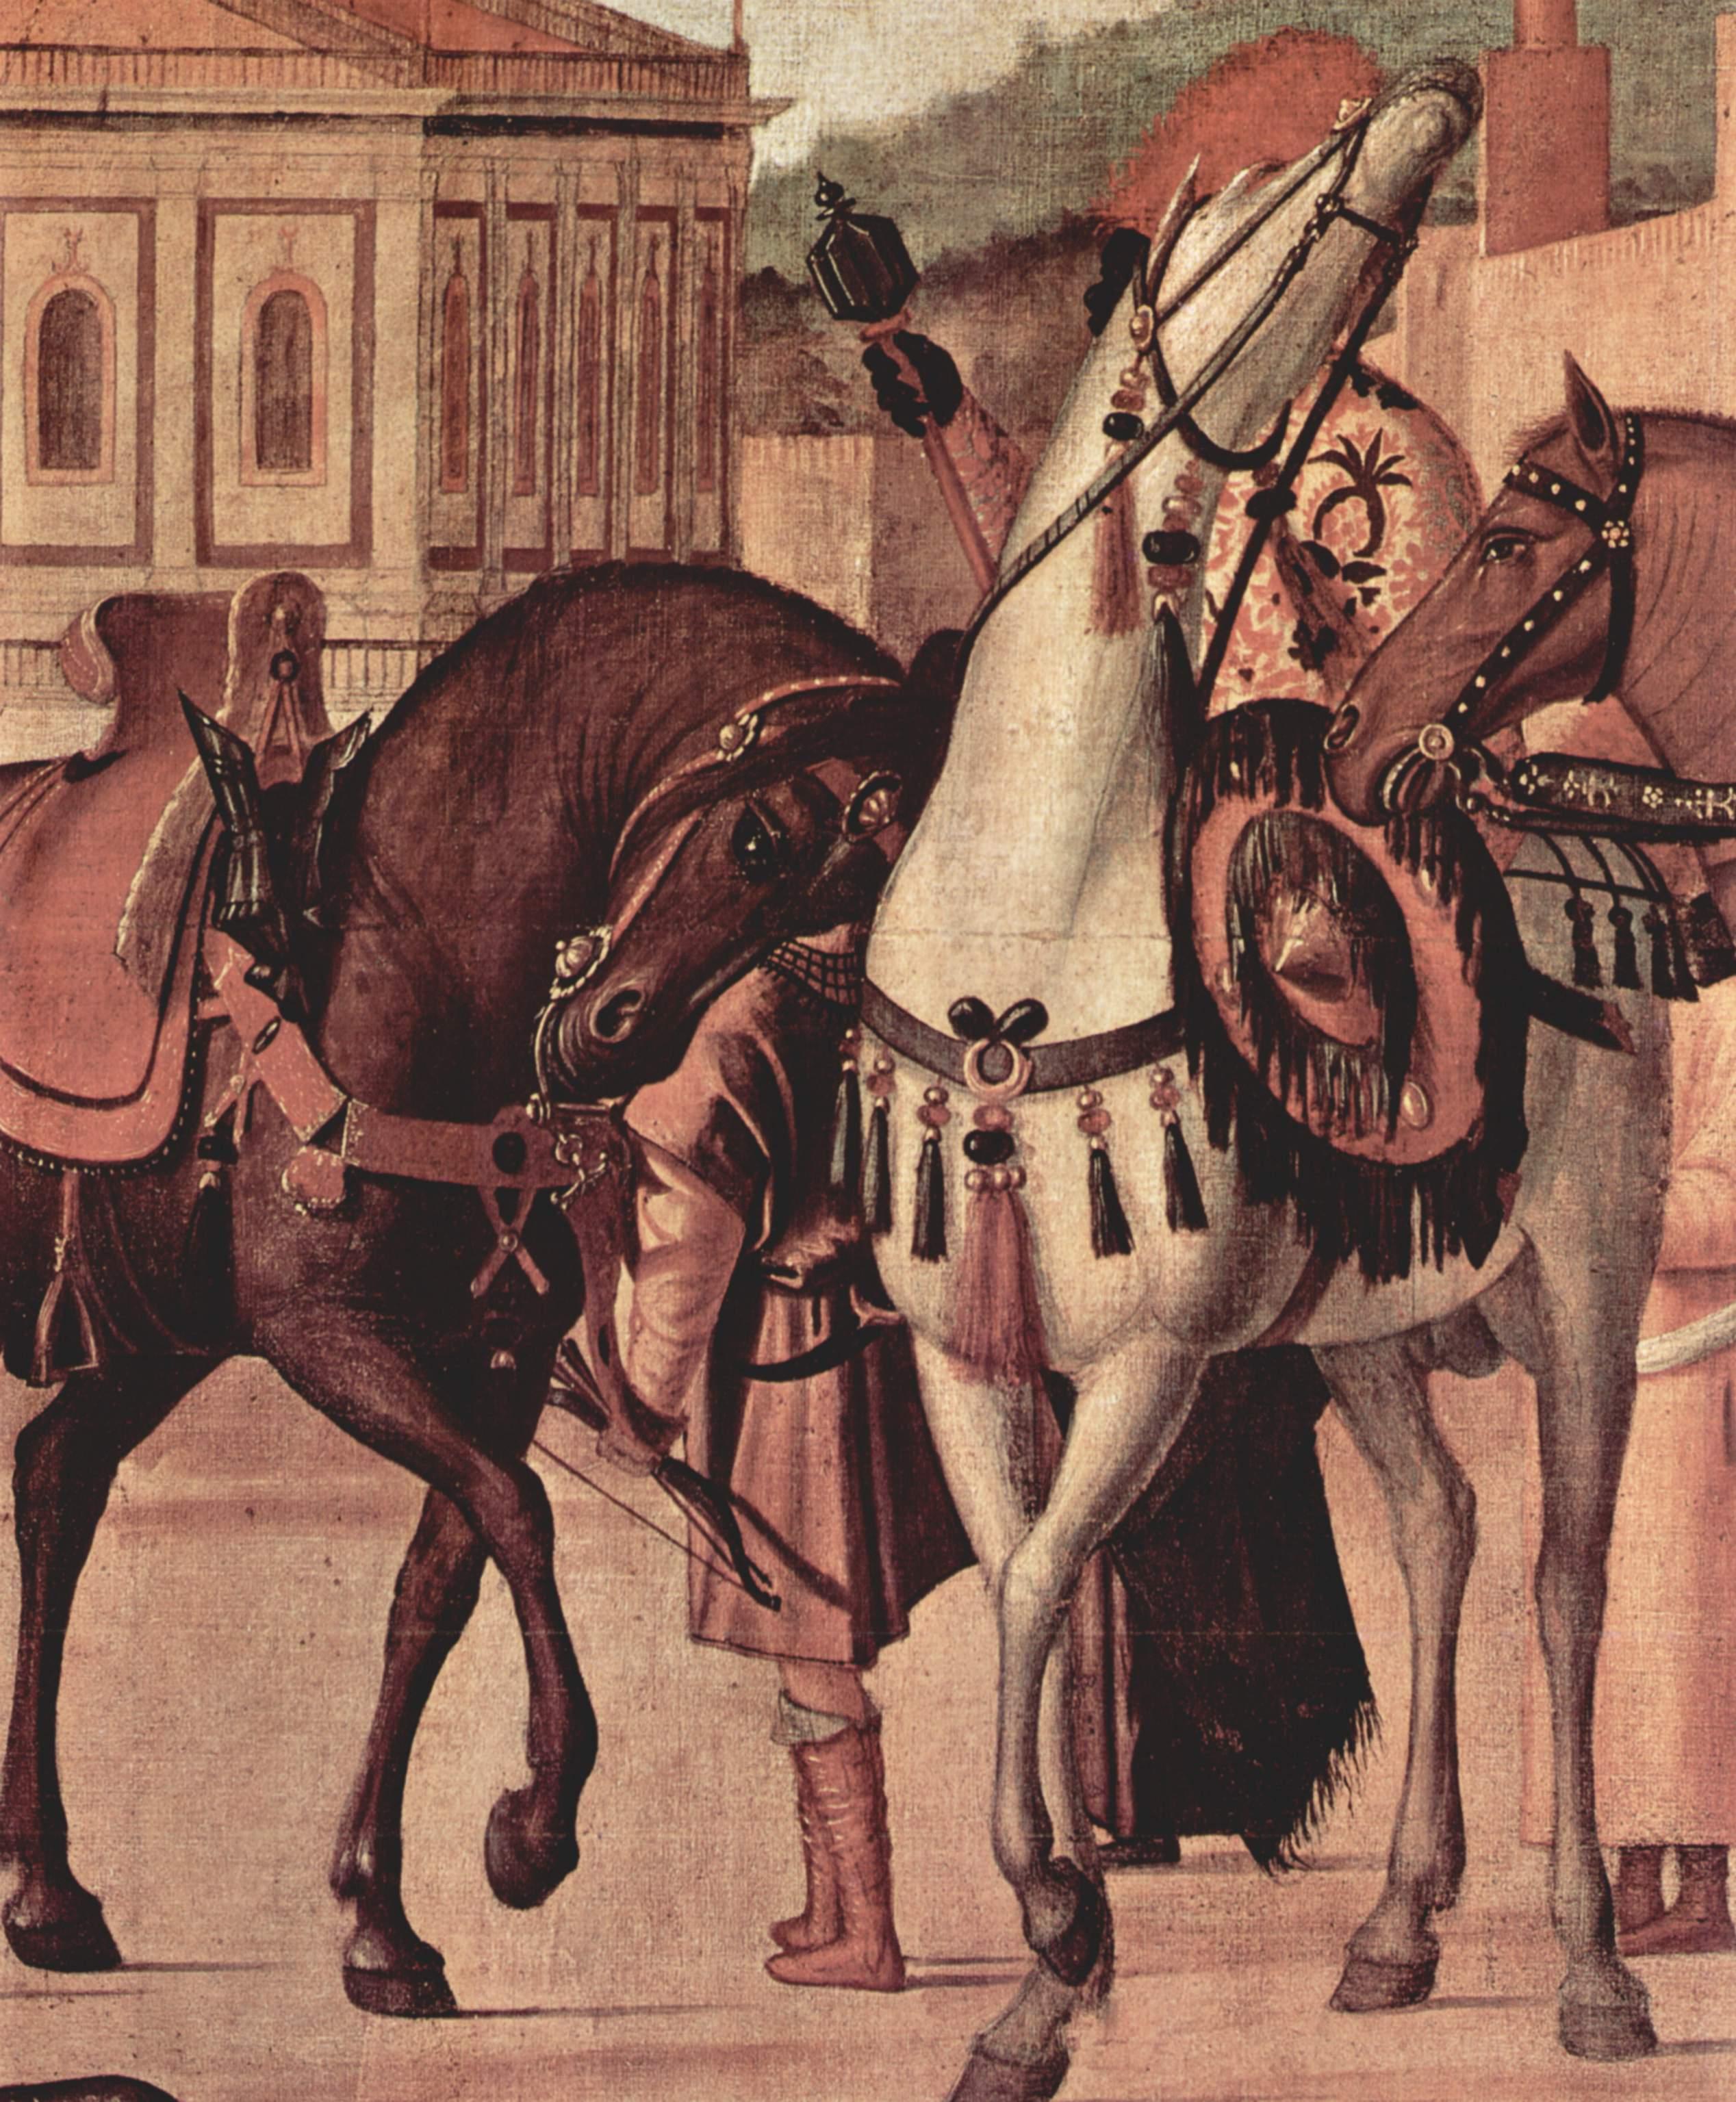 Цикл картин капеллы Скуола ди Сан Джорджио Скьявони, триумф св. Георгия. Деталь, Витторе Карпаччо